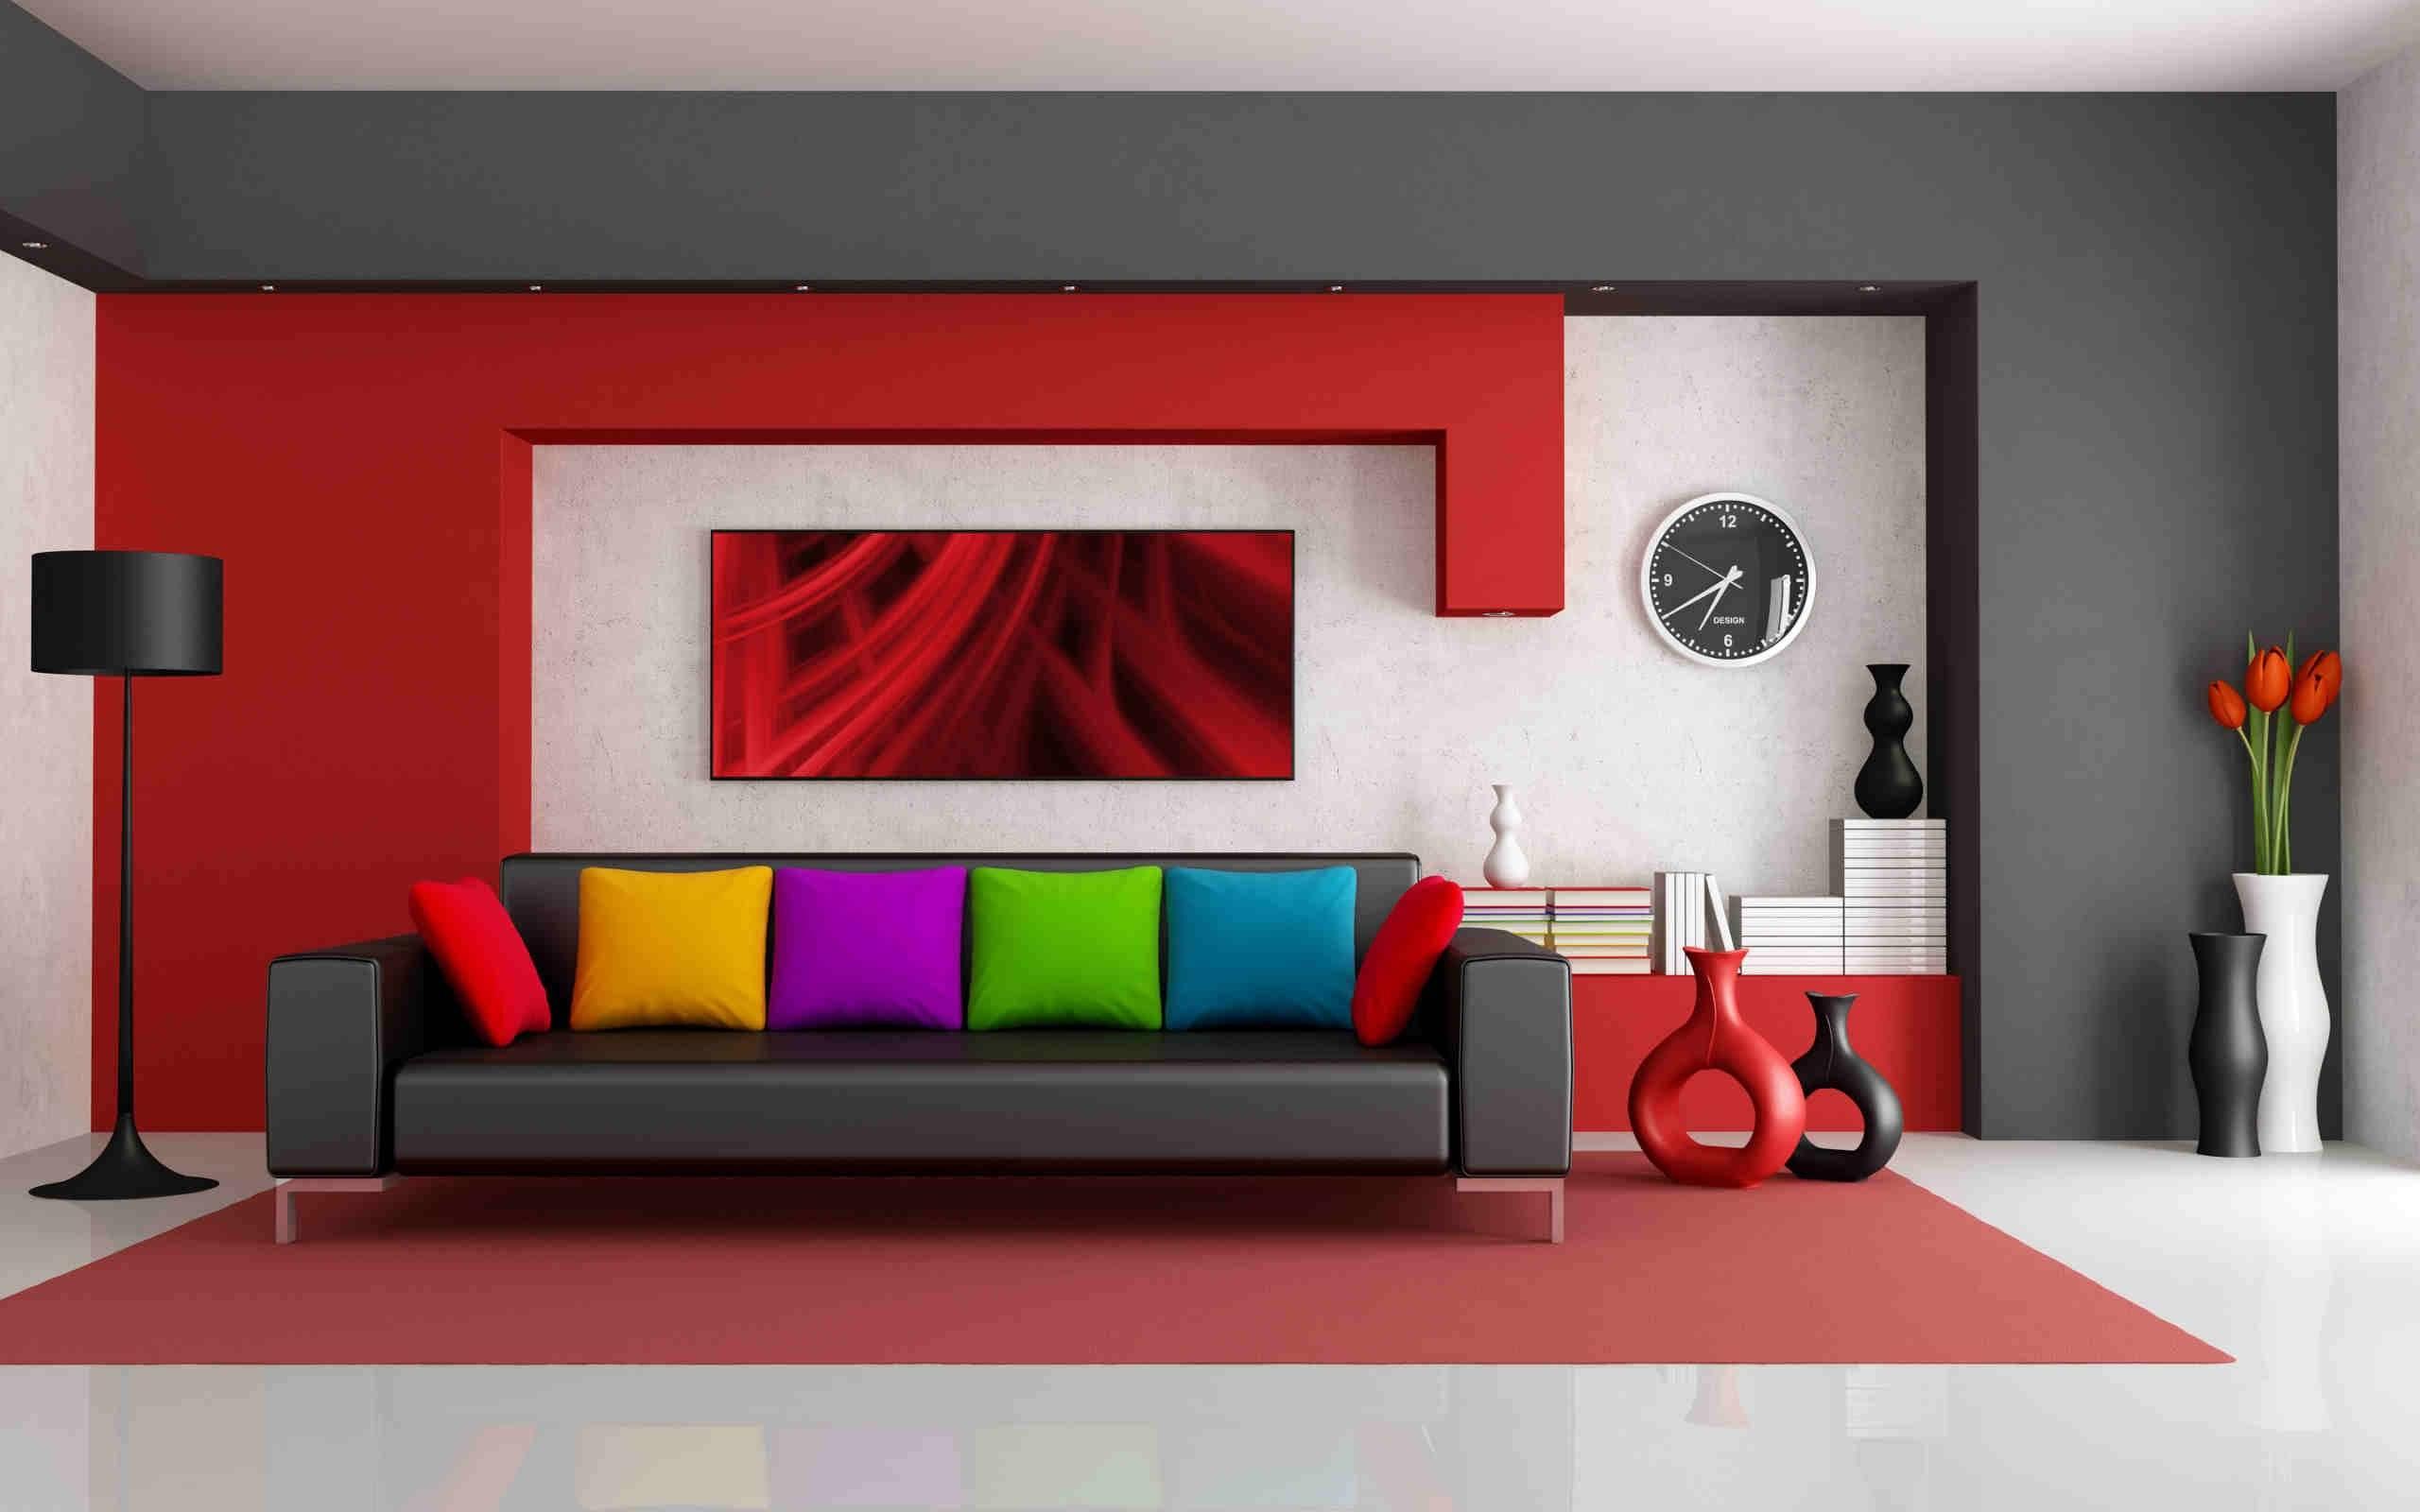 Обои яркий интерьер, диван, подушки, телевизор